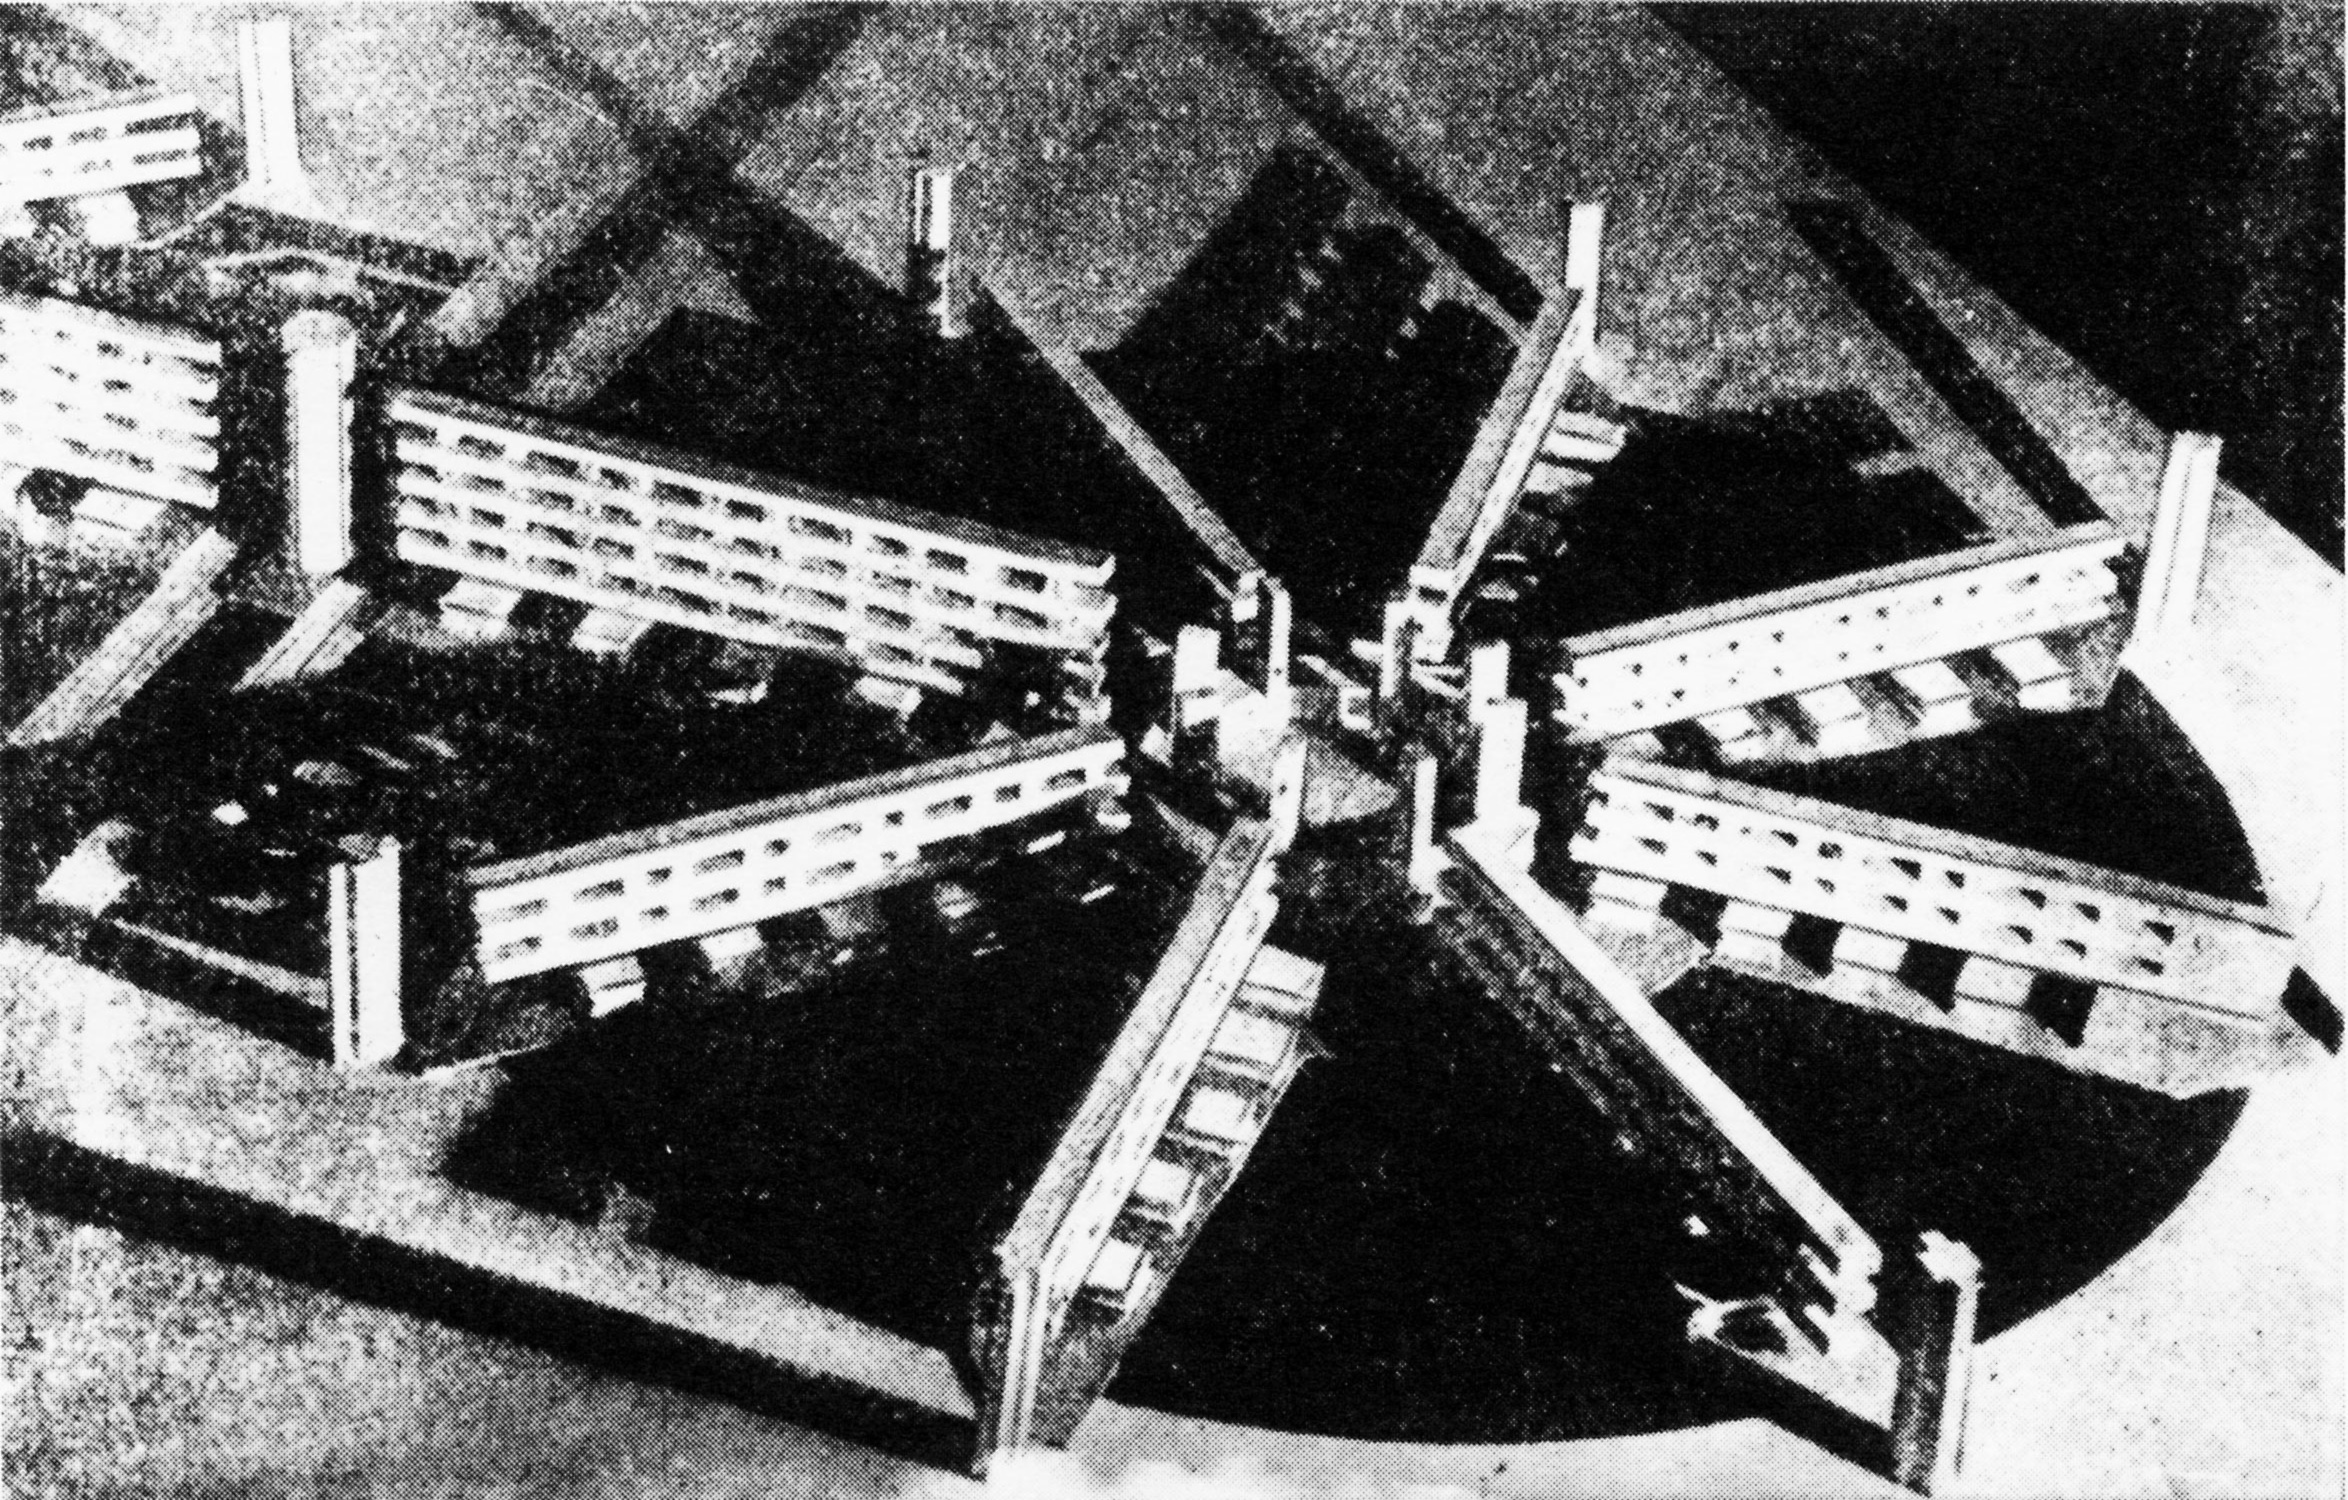 "V. Popov, Diploma project on the theme of the ""New City"" (1928), studio of Nikolai Ladovskii, housing commune model"